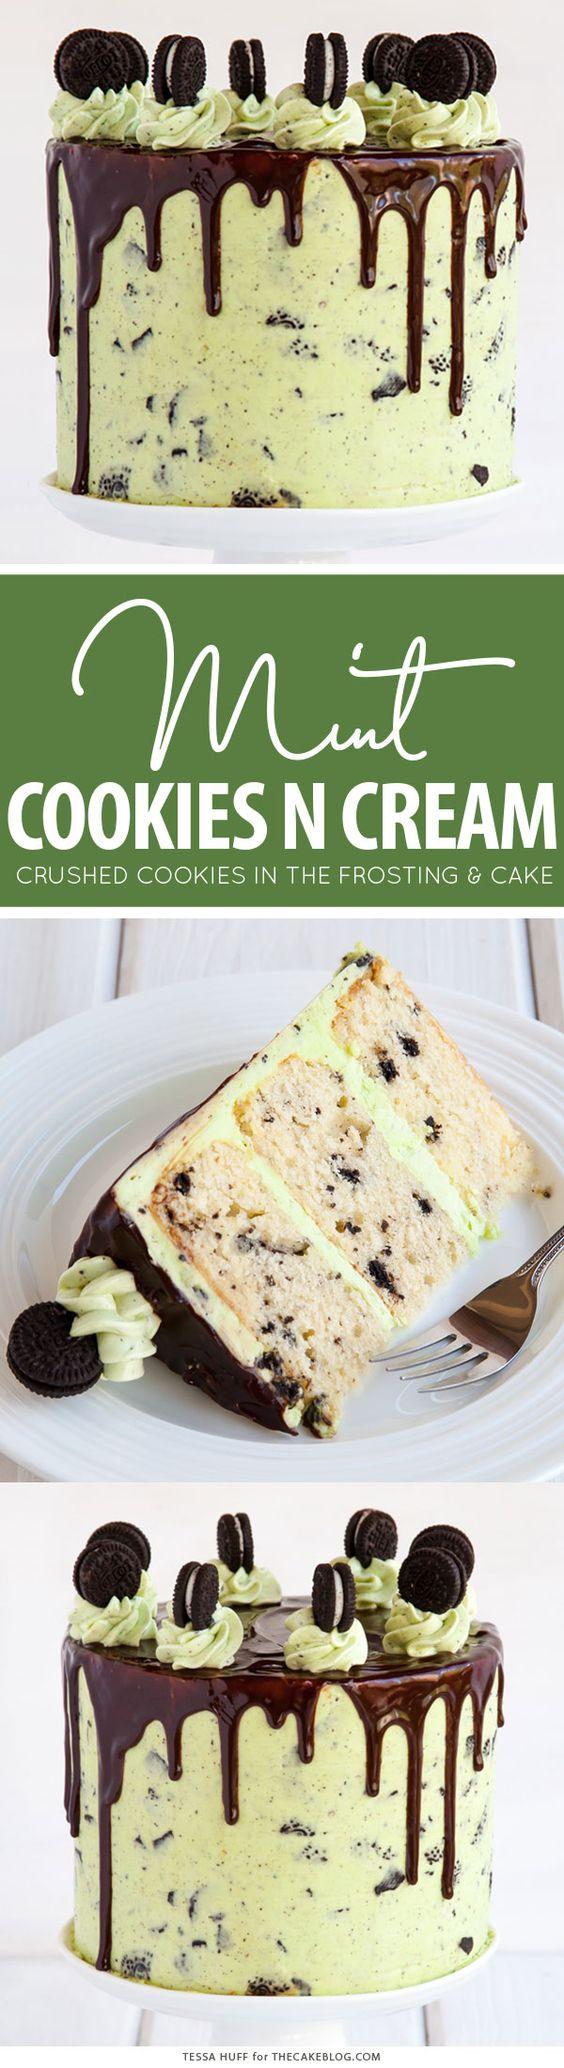 Mint Cookies and Cream Cake Recipe